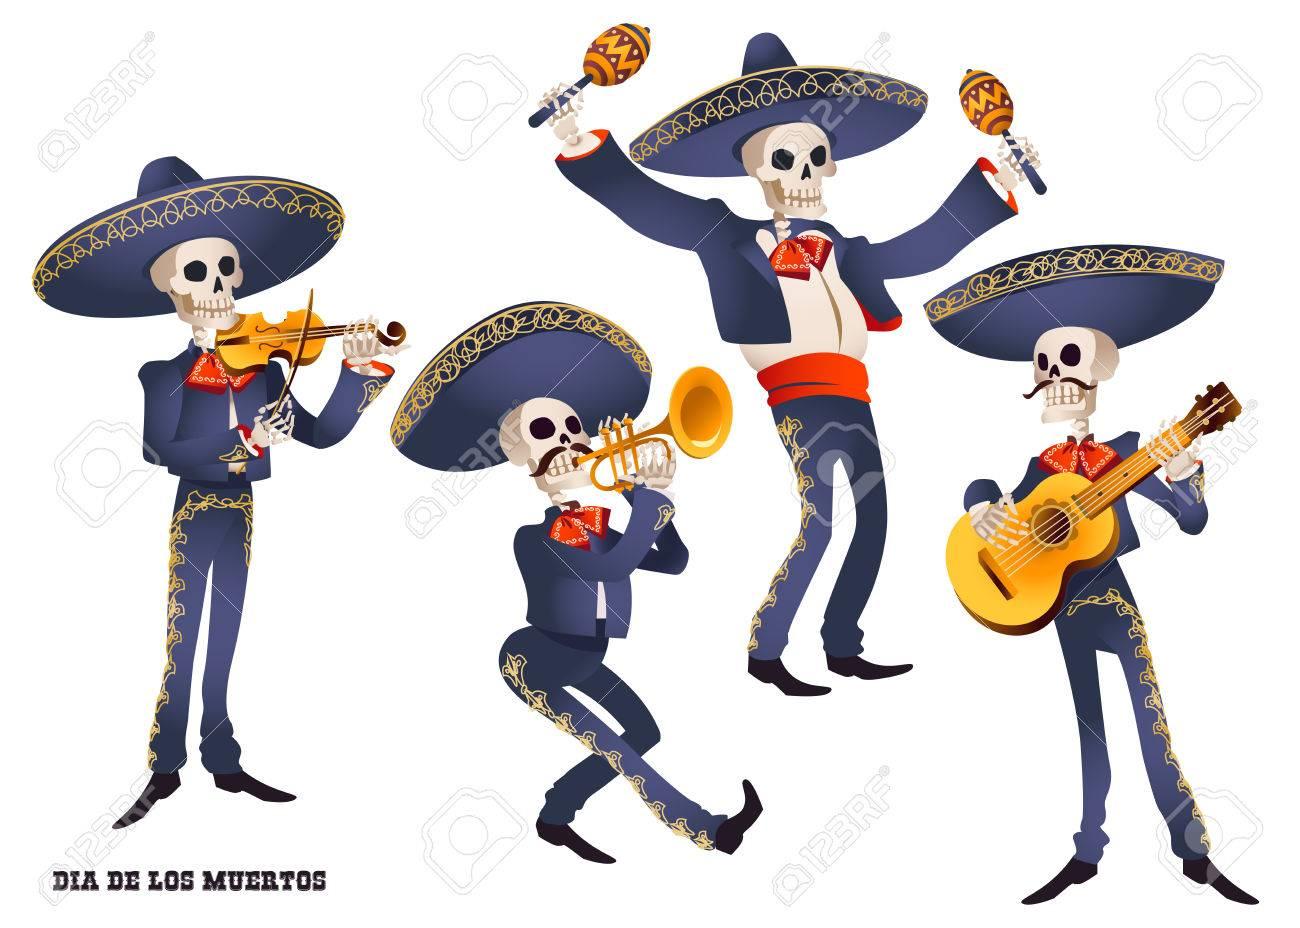 2 446 mariachi cliparts stock vector and royalty free mariachi rh 123rf com mariachi clipart images mariachi man clipart